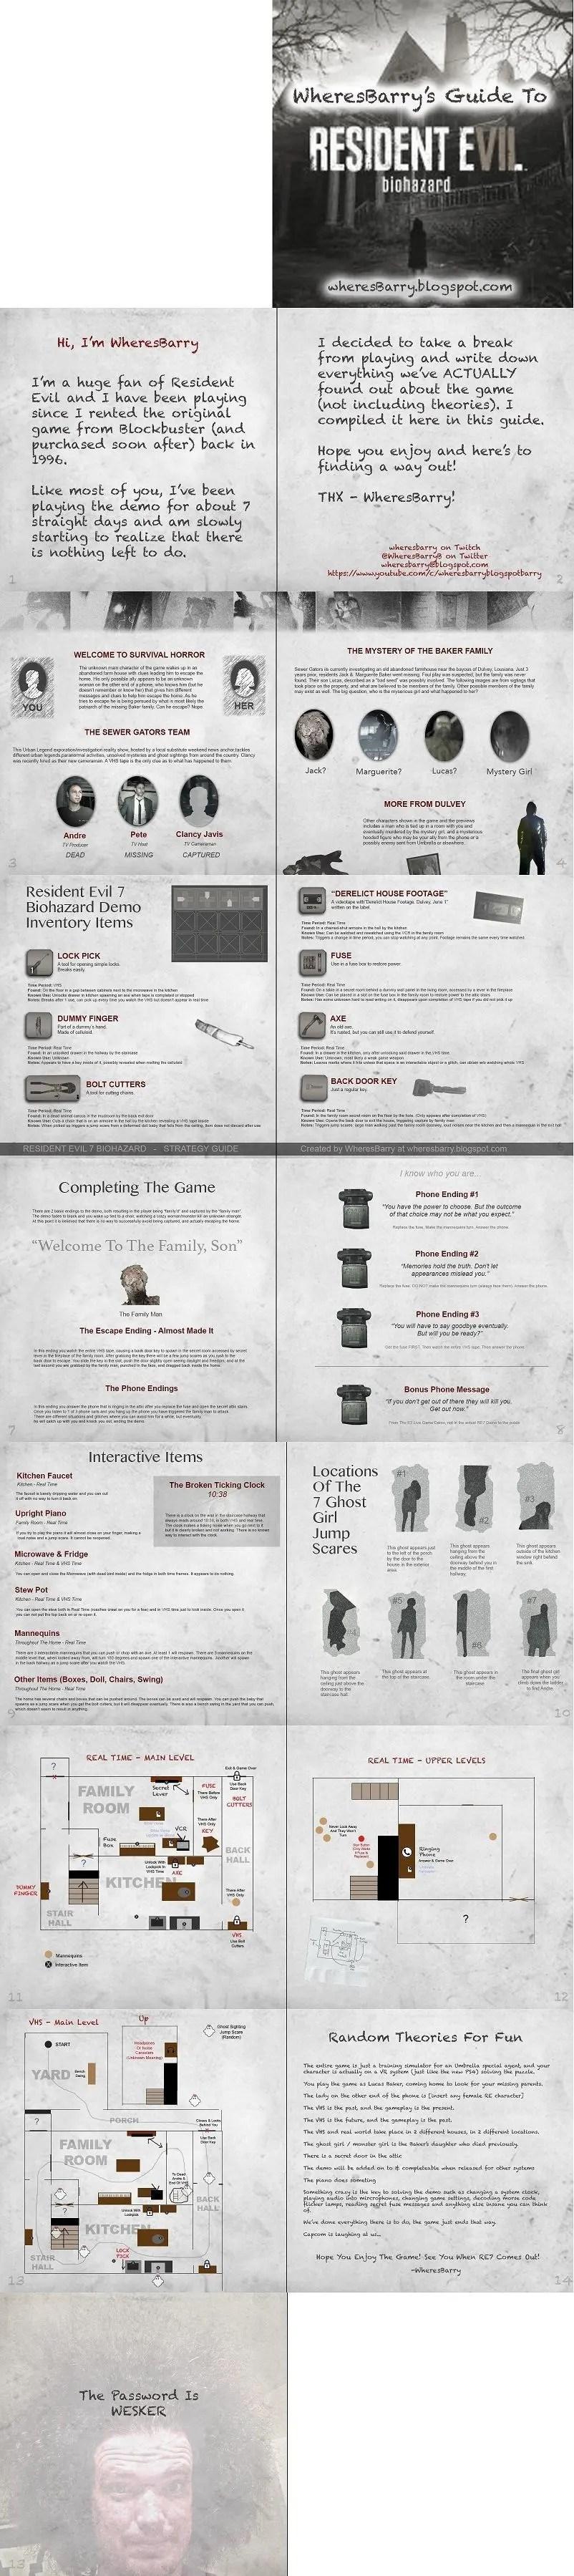 Guía Resident Evil demo